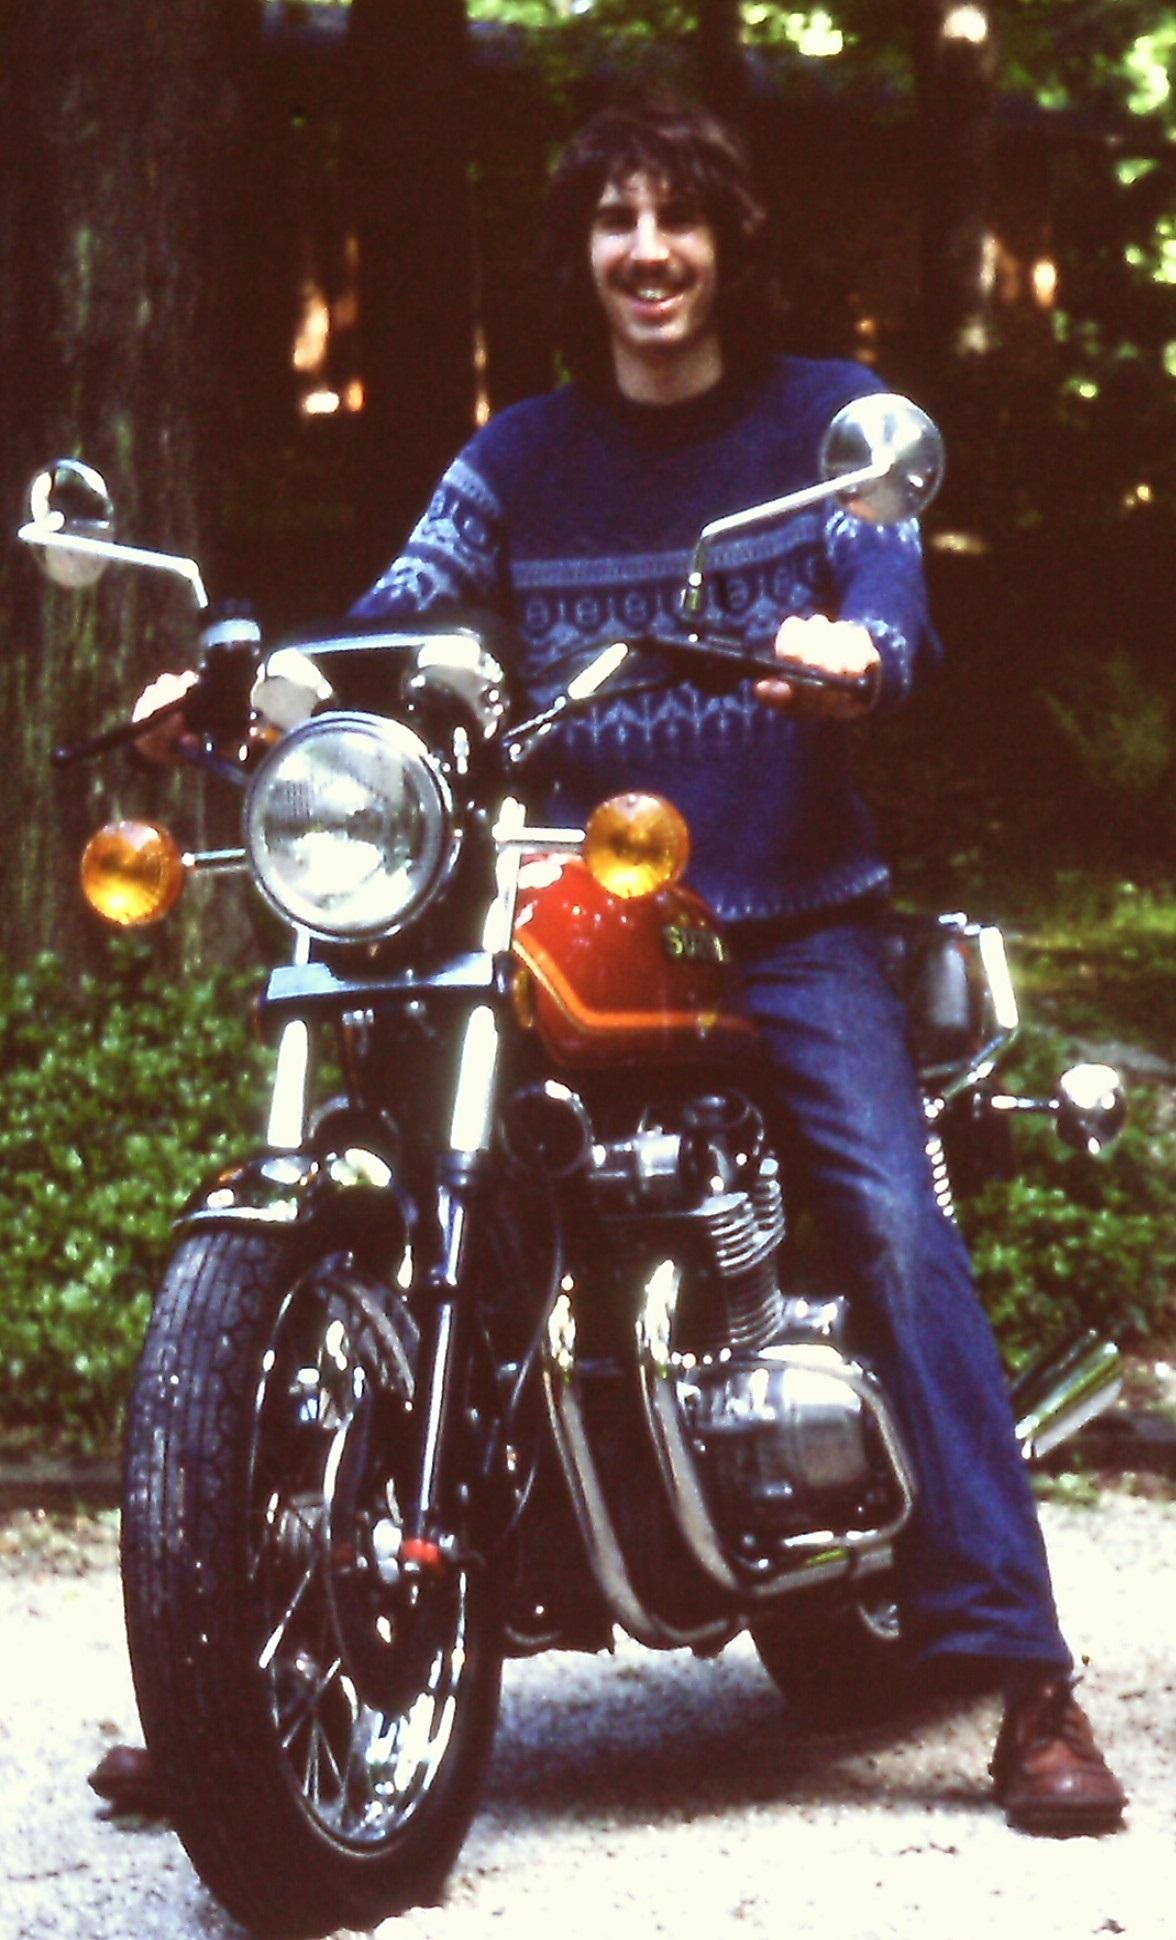 Neil - USA and Canada by bike - 1980 (7)